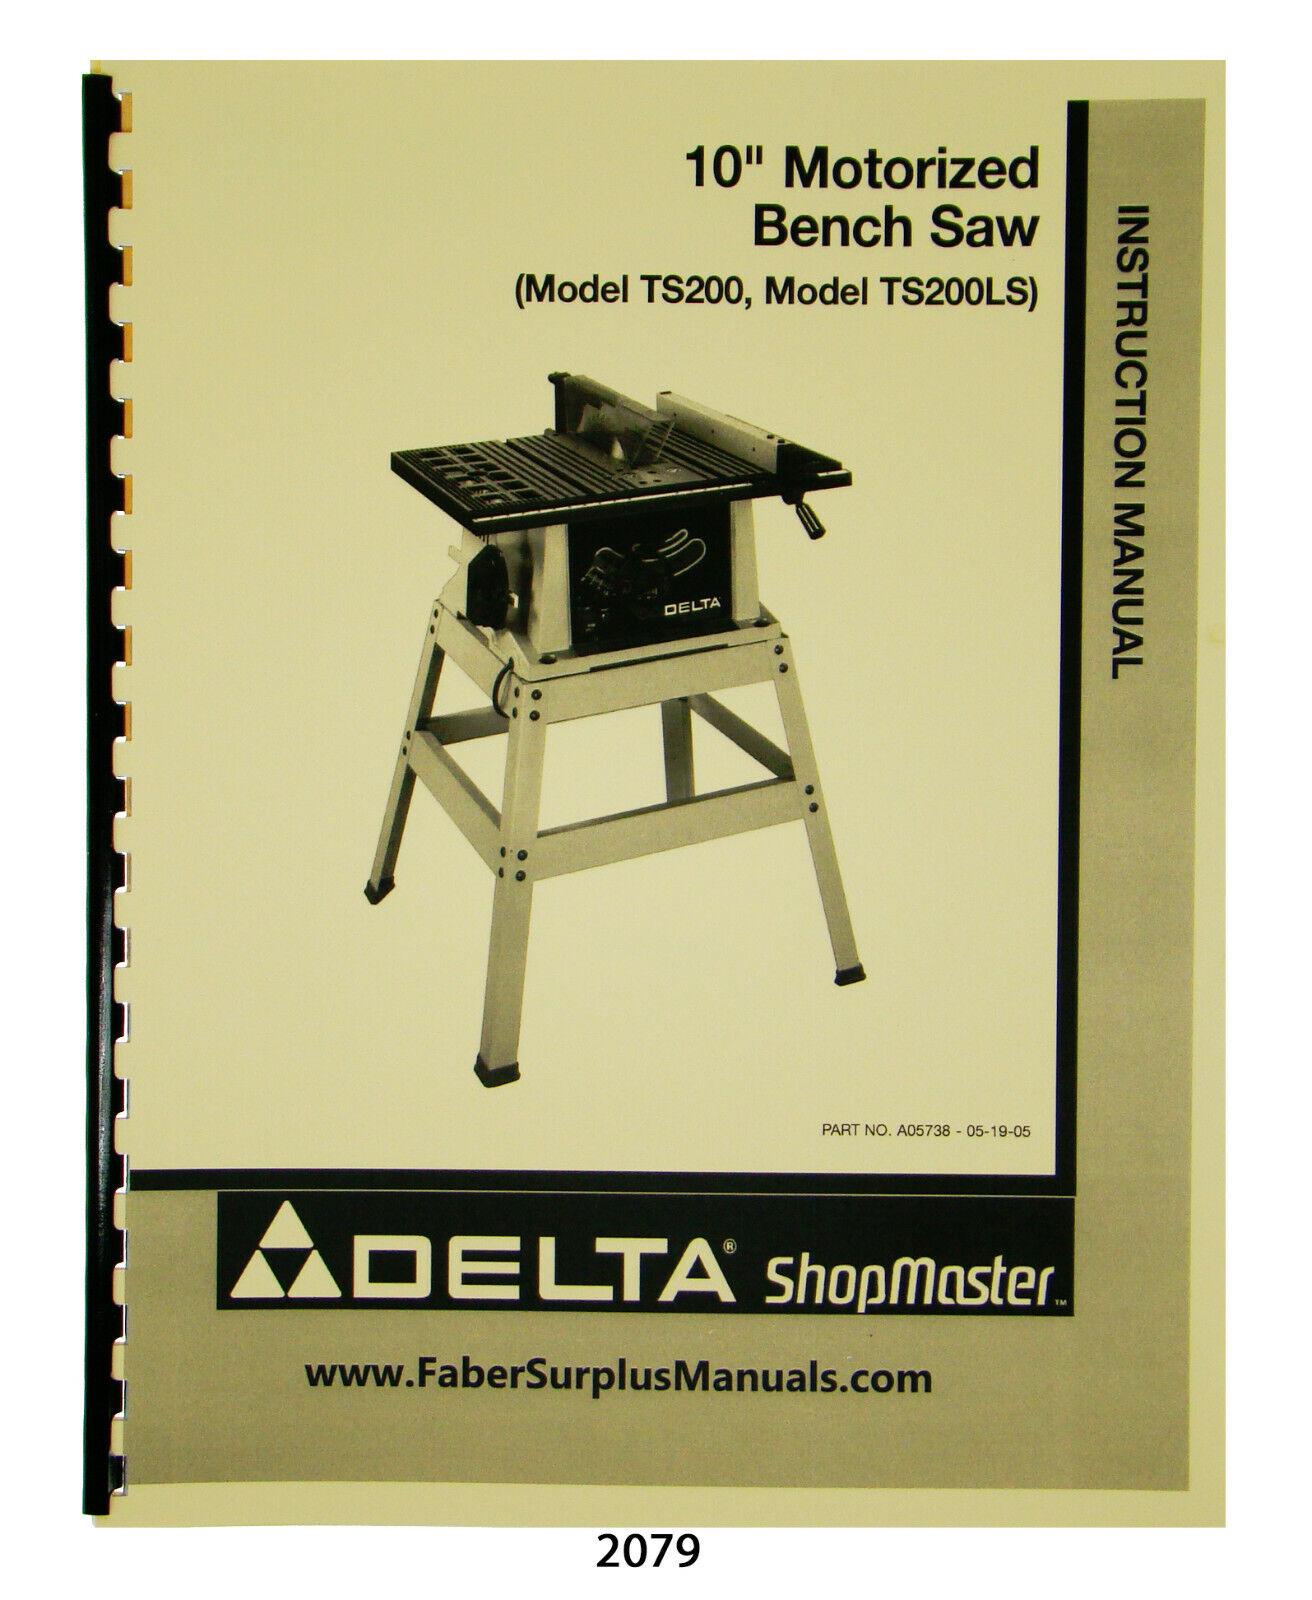 Delta 10 Motorized Bench Saw For Sale Online Ebay